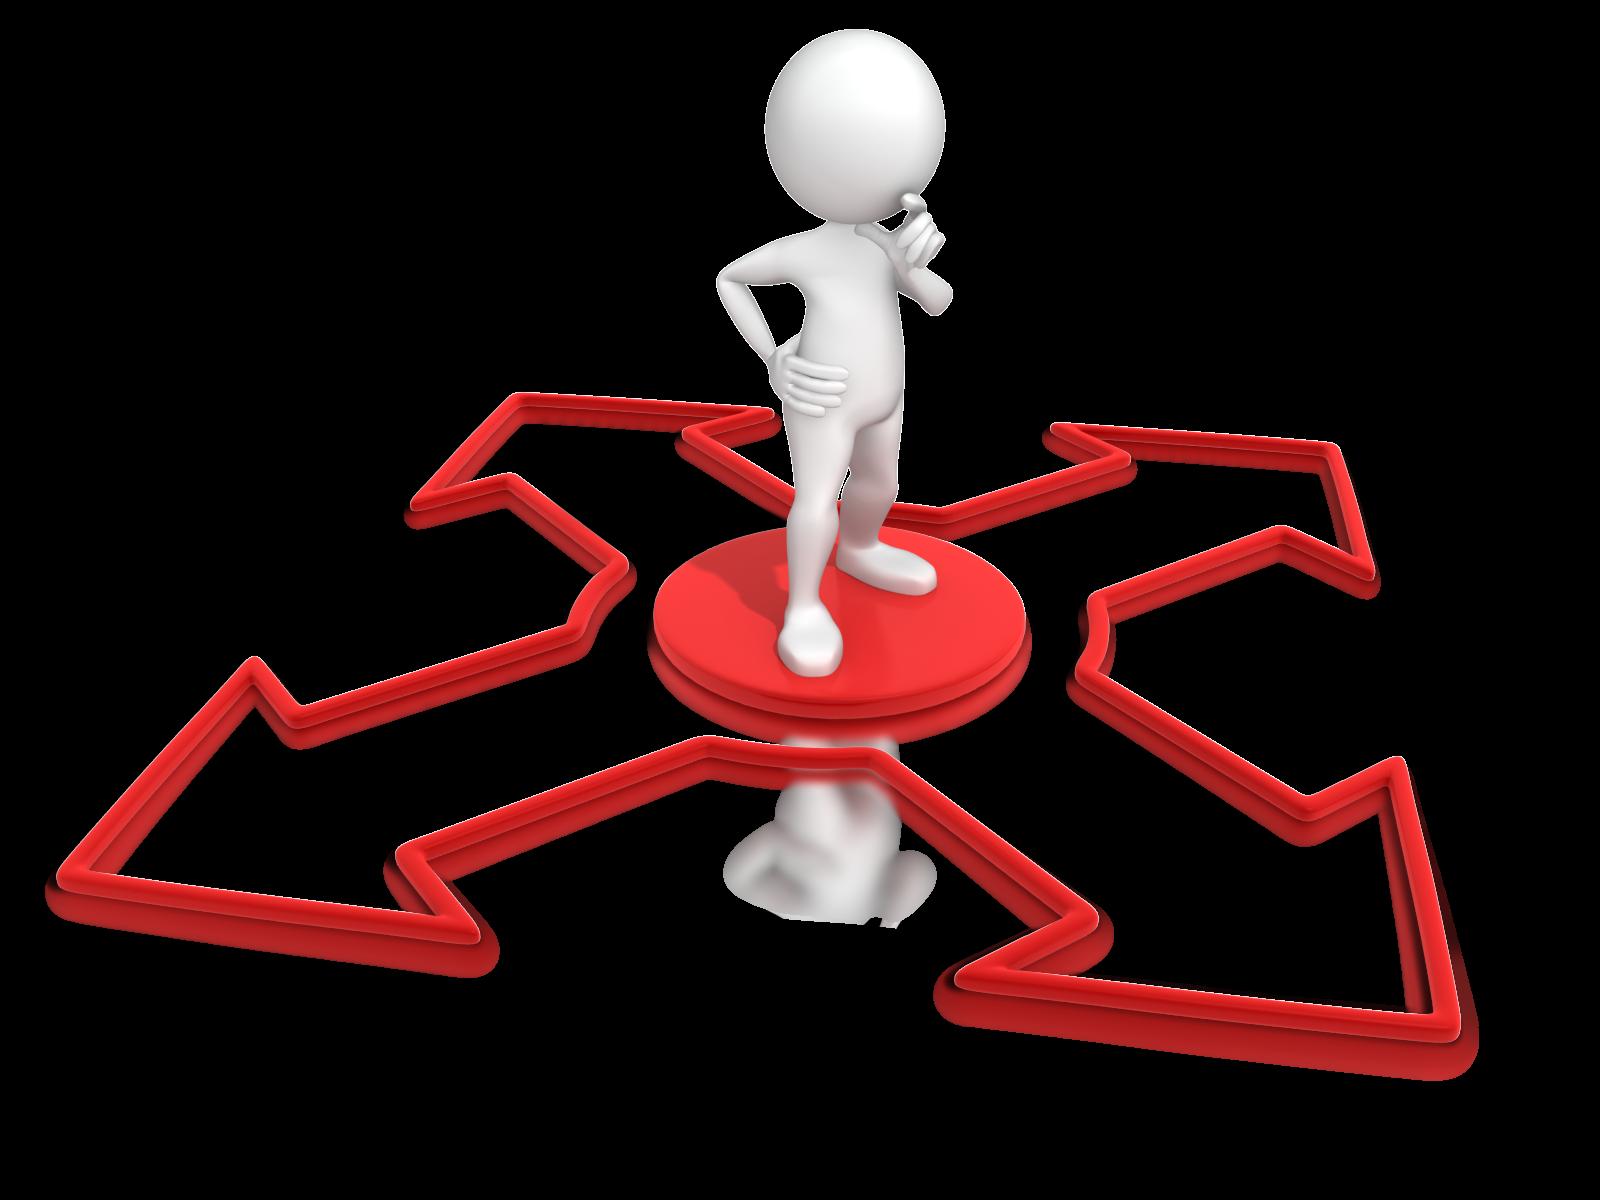 Statistics clipart actuary. Deciding between career paths